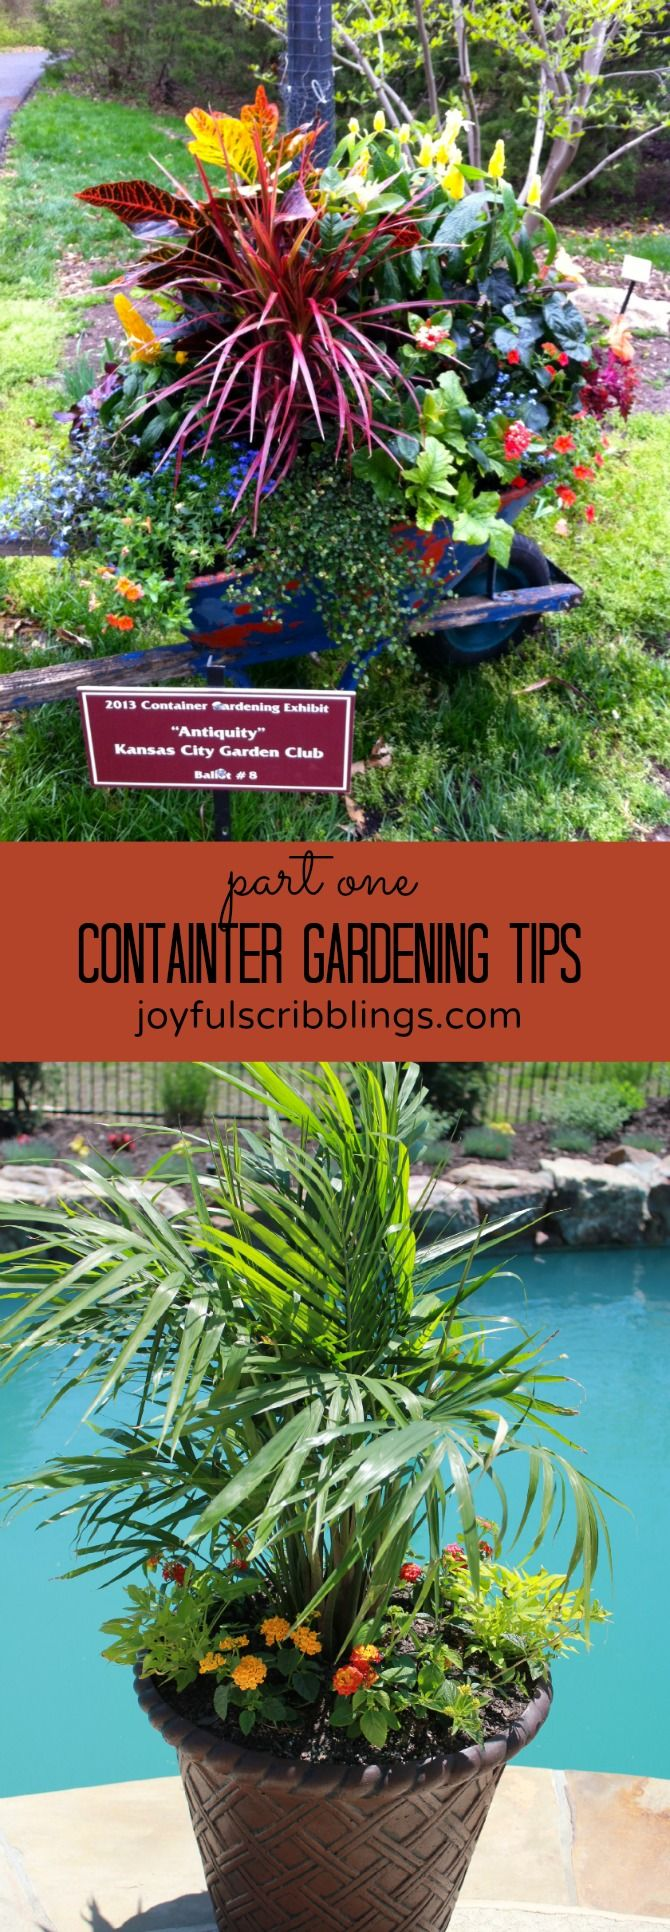 conatiner gardening tips